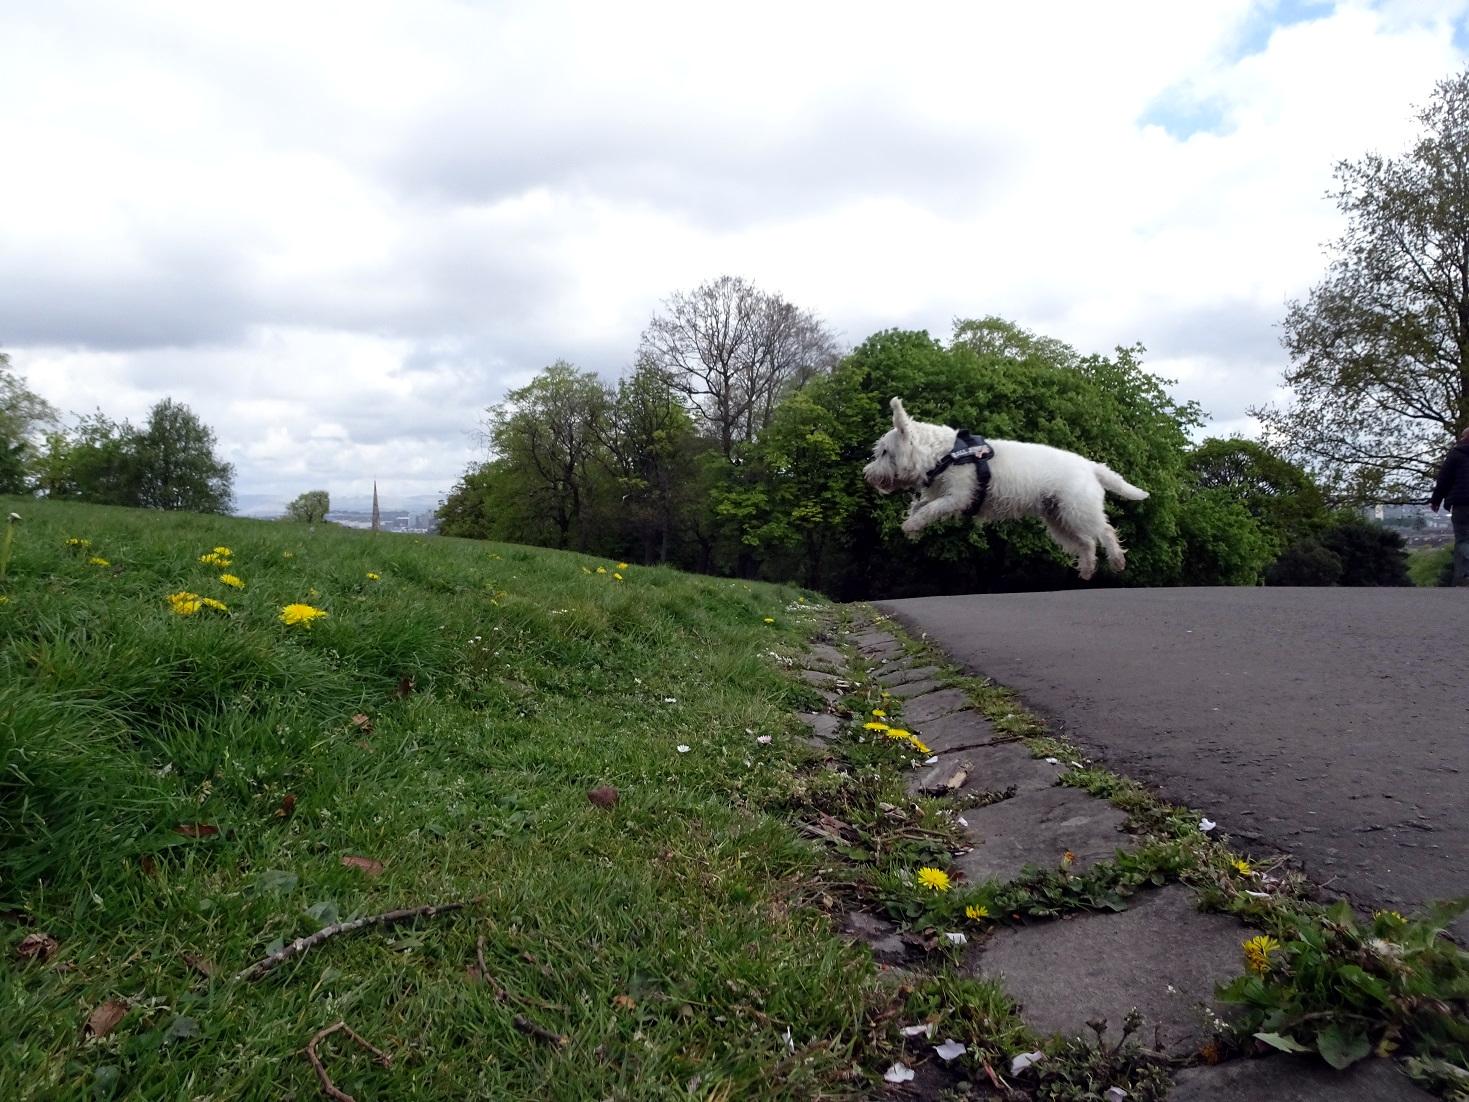 poppy the westie mid jump